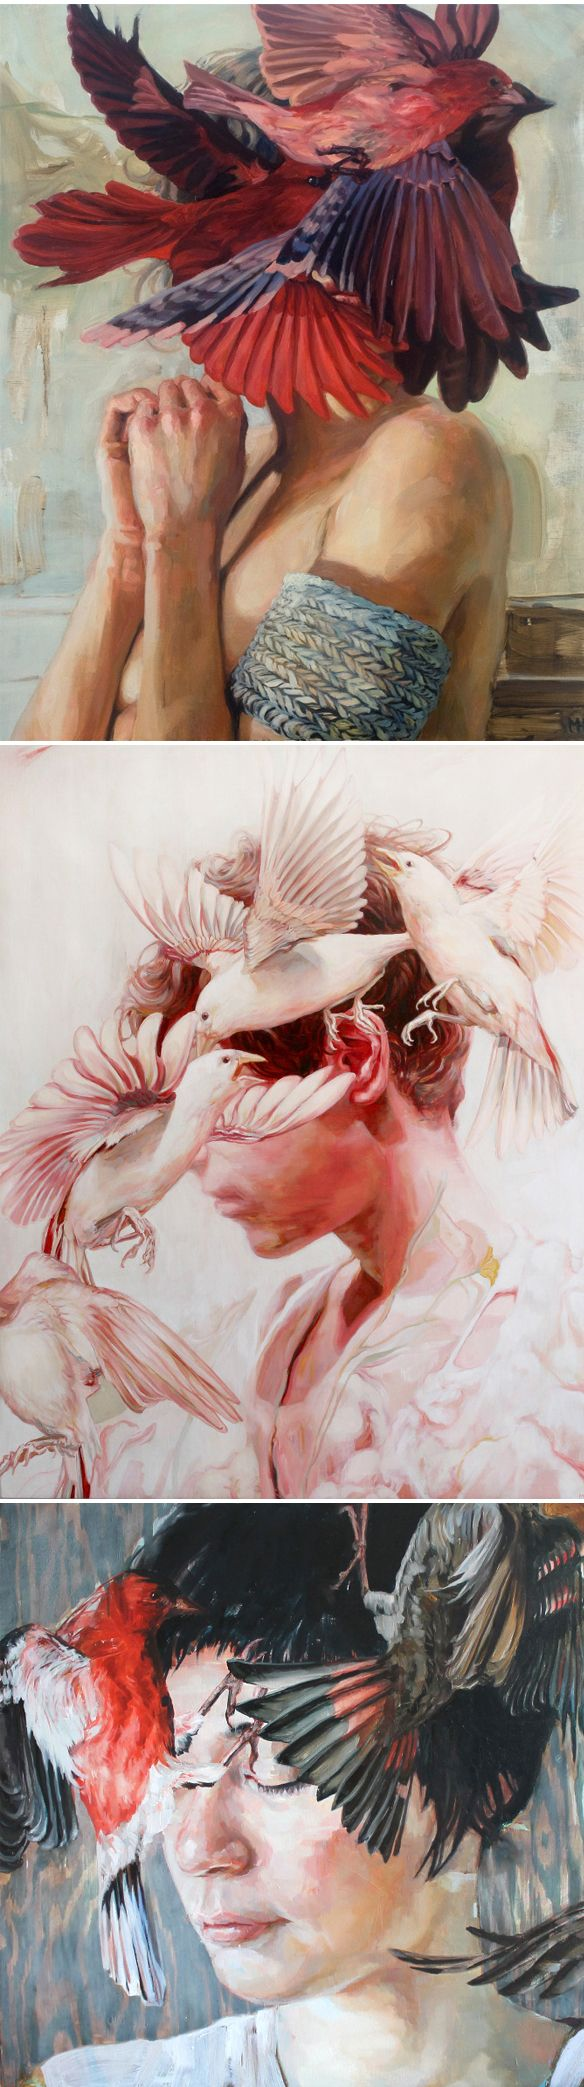 paintings by meghan howland//